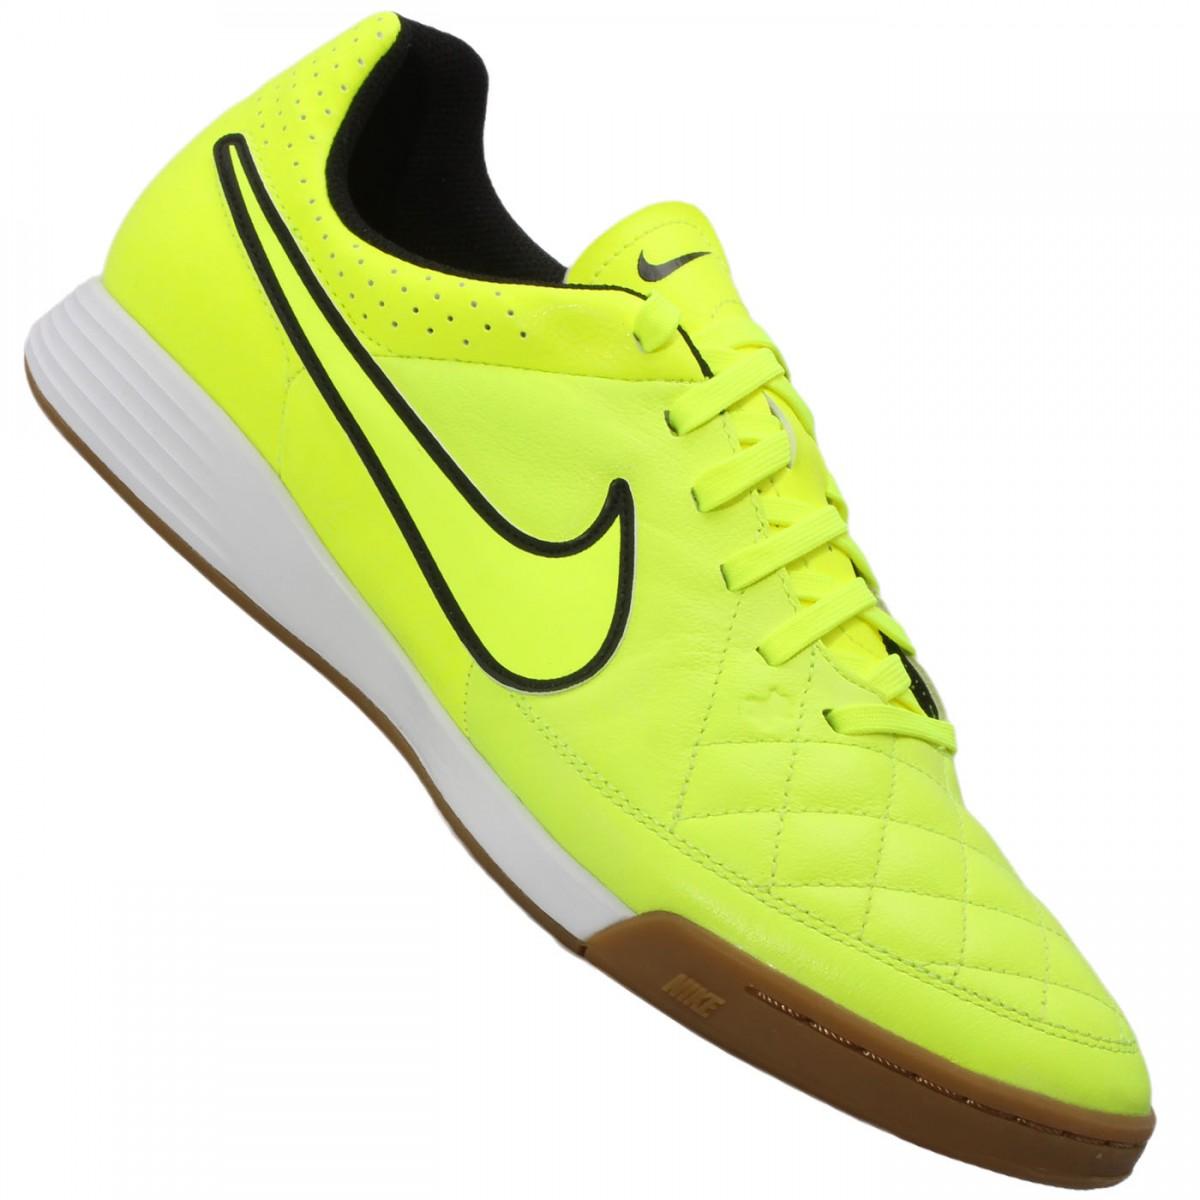 67bff359c43ff Tênis Nike Tiempo Gênio Leather IC